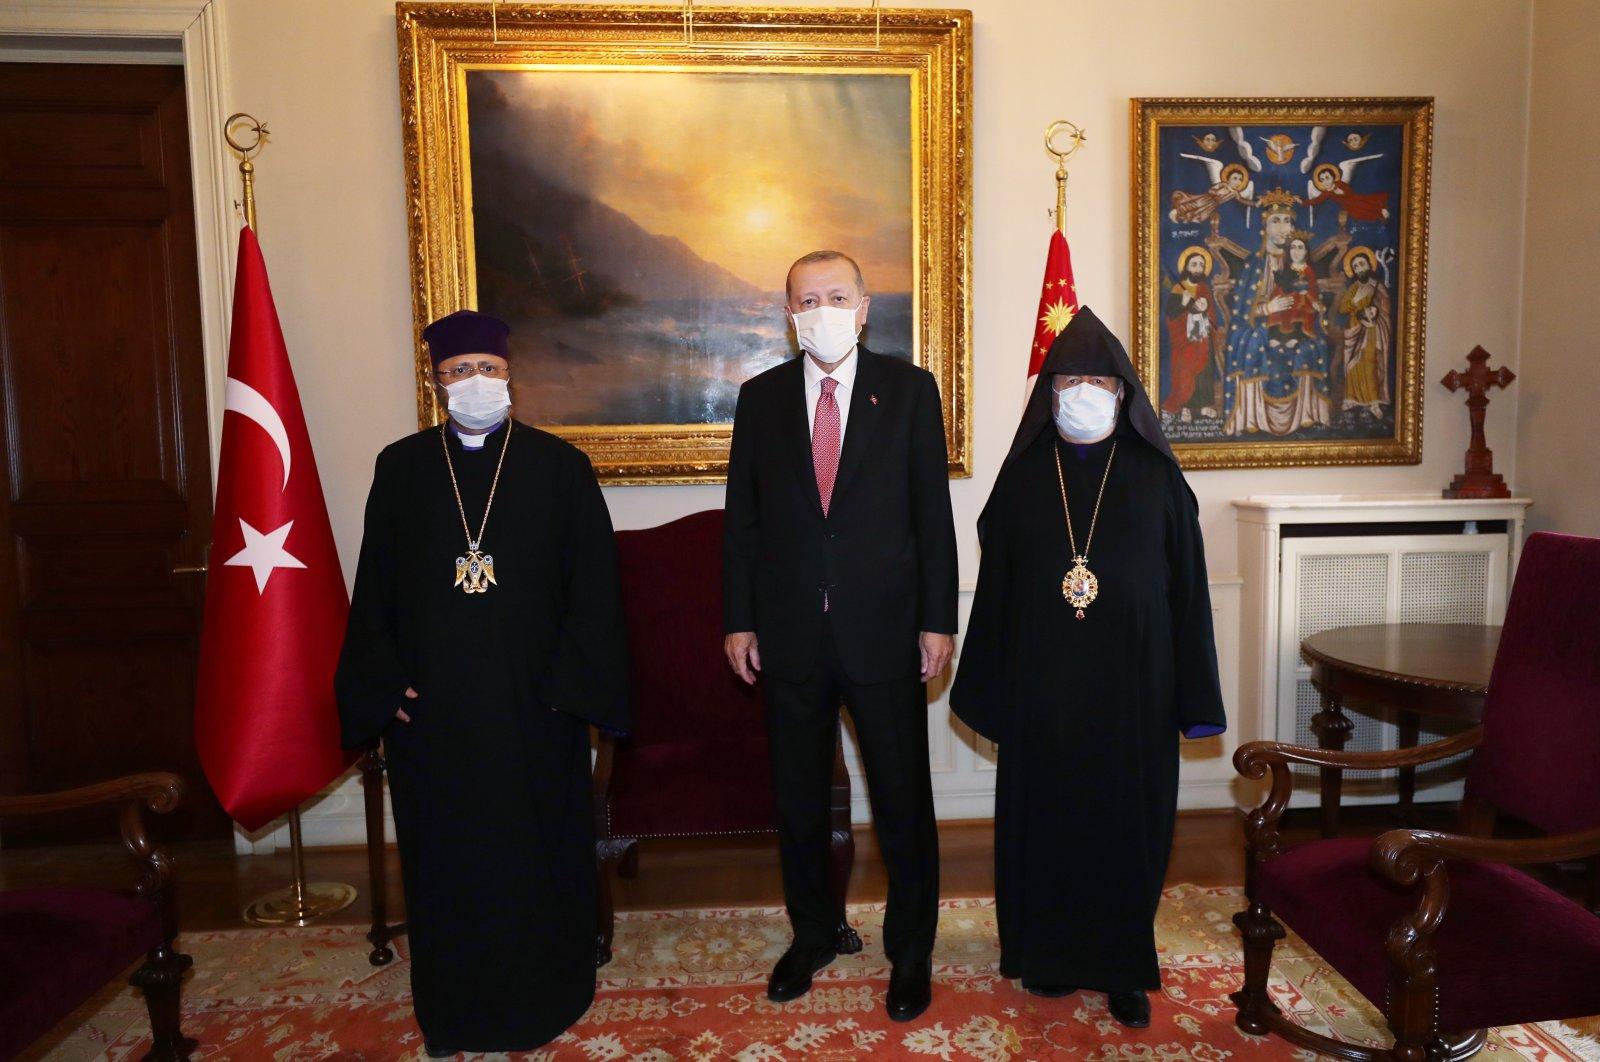 President Recep Tayyip Erdoğan (C) meets with Armenian Patriarch Sahak Maşalyan (L) in Istanbul, Turkey, Oct. 22, 2020. (AA Photo)